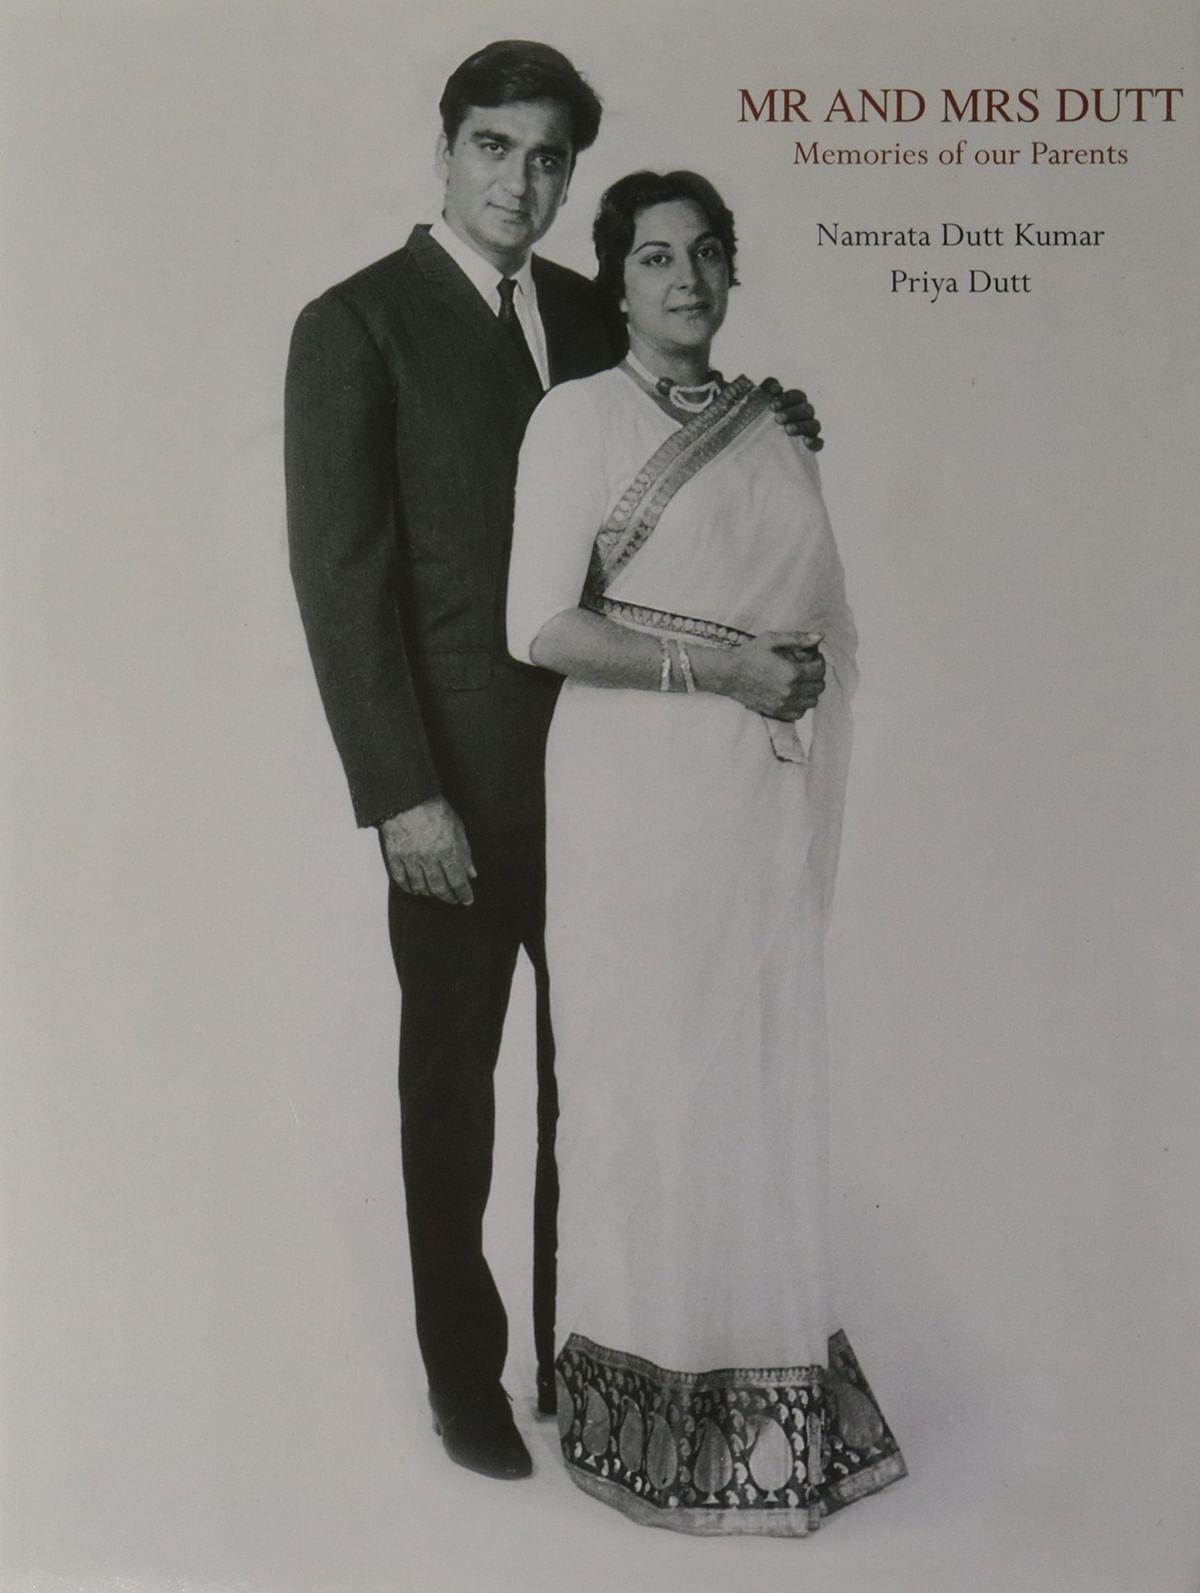 <i>Mr &amp; Mrs Dutt: Memories of our Parents</i>